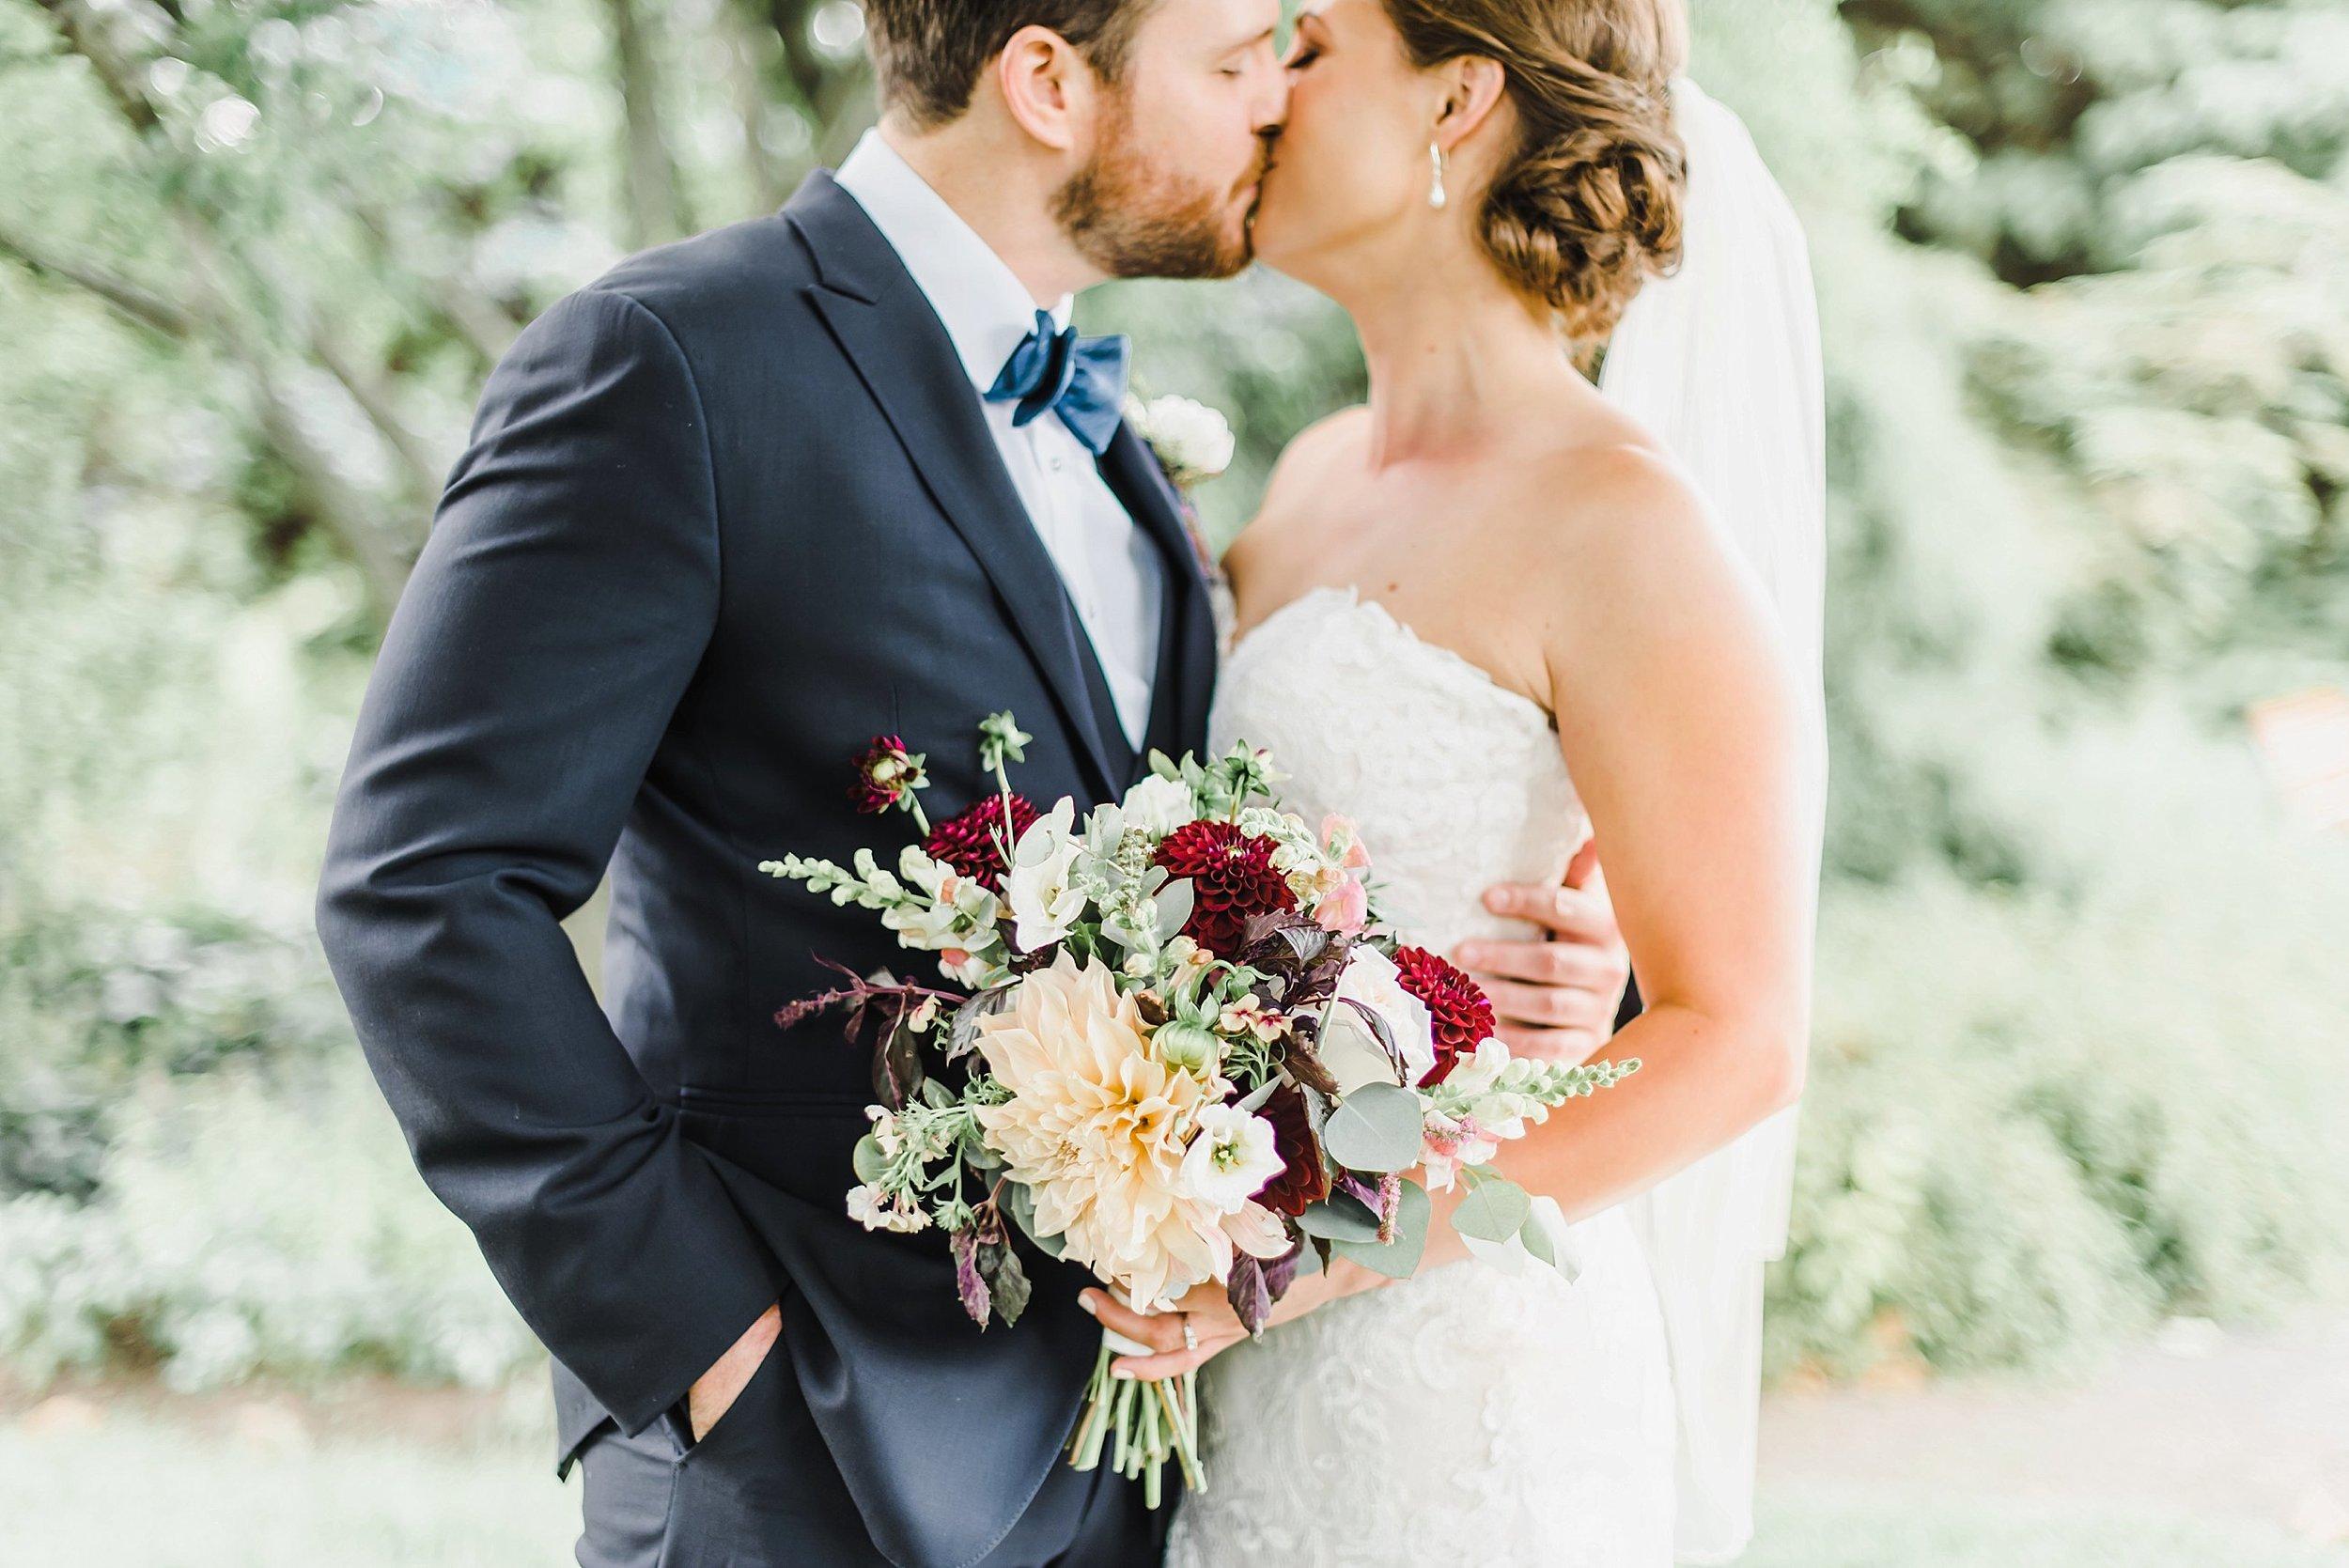 light airy indie fine art ottawa wedding photographer   Ali and Batoul Photography_1003.jpg